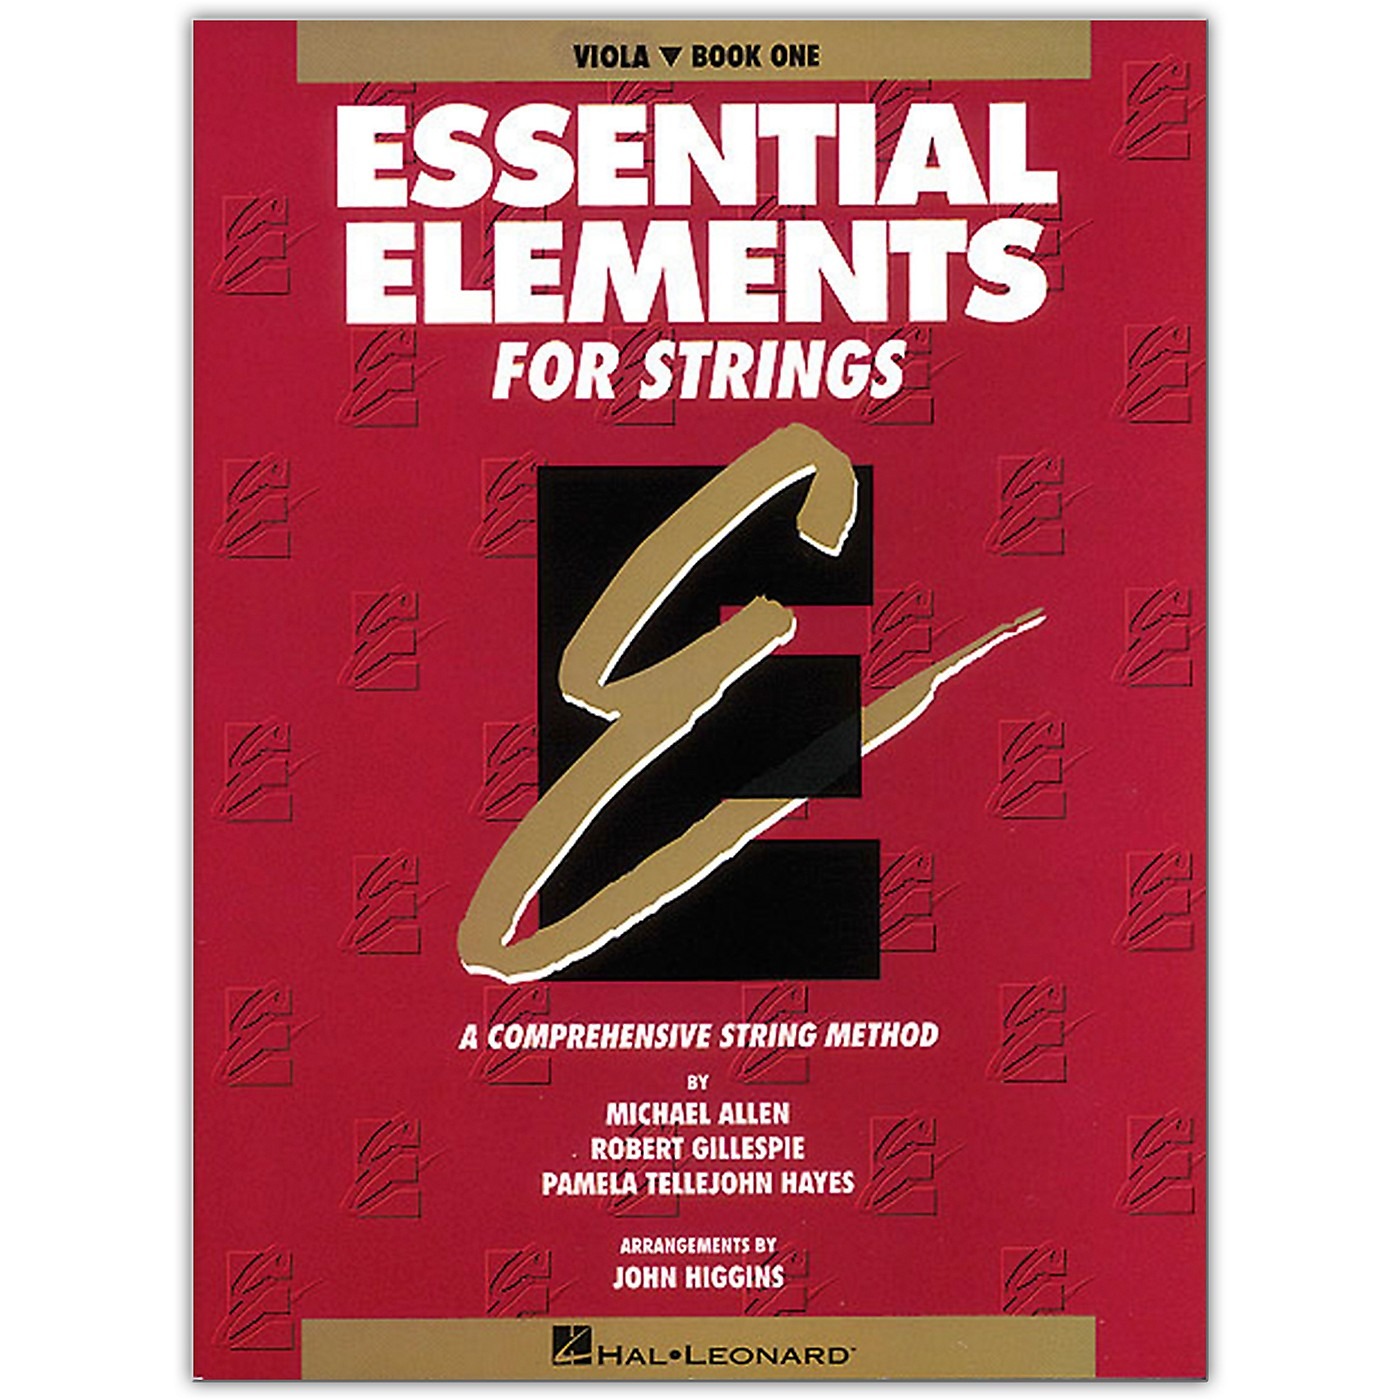 Hal Leonard Essential Elements for Strings Book 1 Viola thumbnail